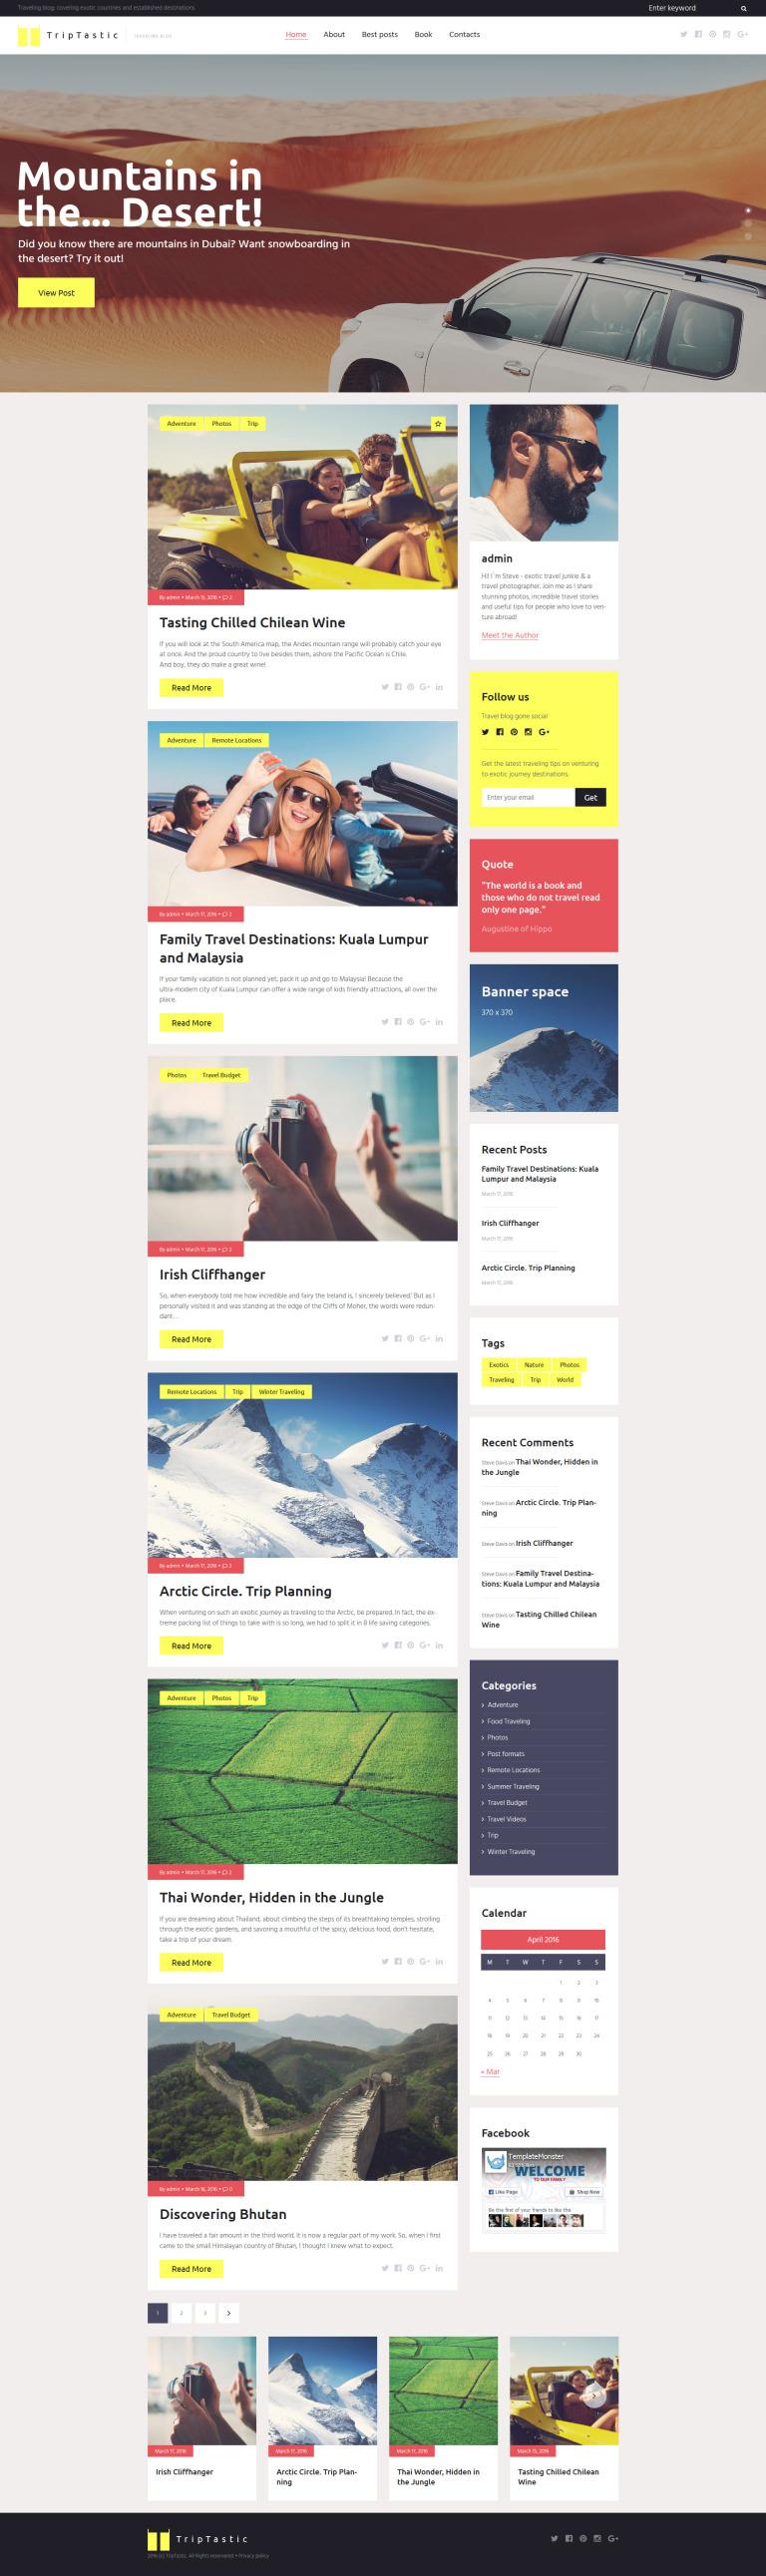 TripTastic - Travel Blog WordPress Theme New Screenshots BIG